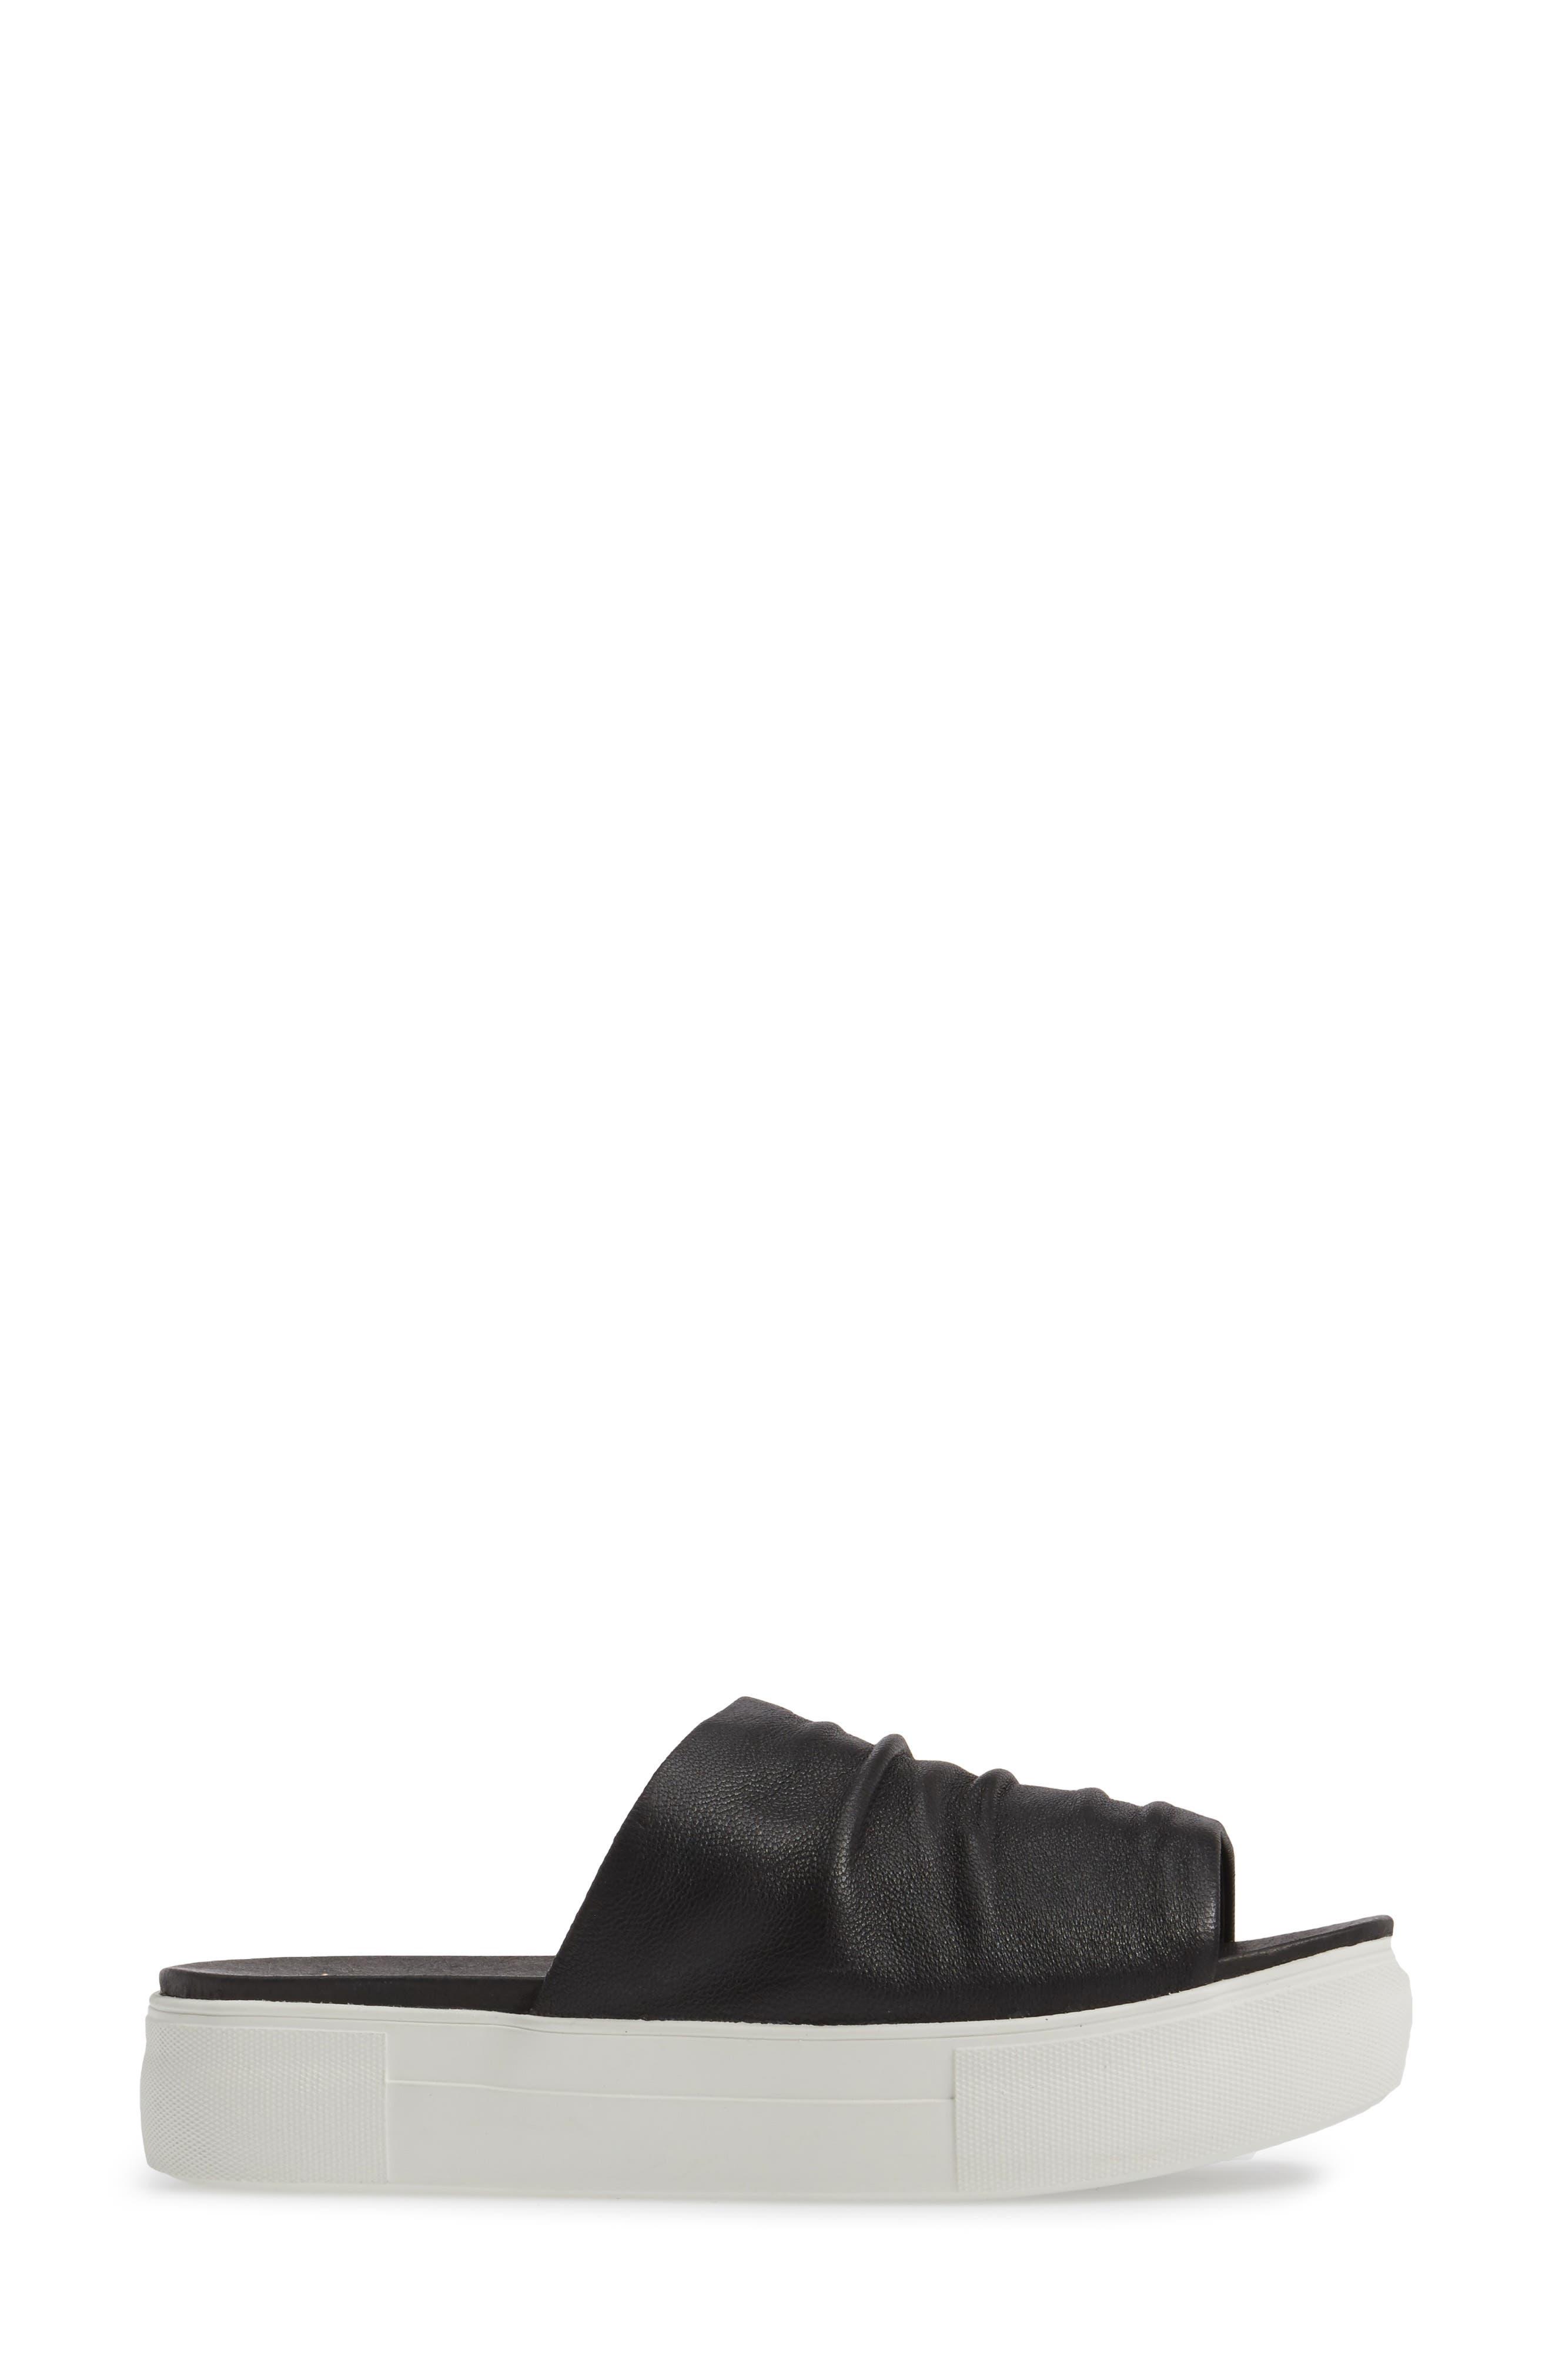 Alura Platform Slide Sandal,                             Alternate thumbnail 2, color,                             Black Leather